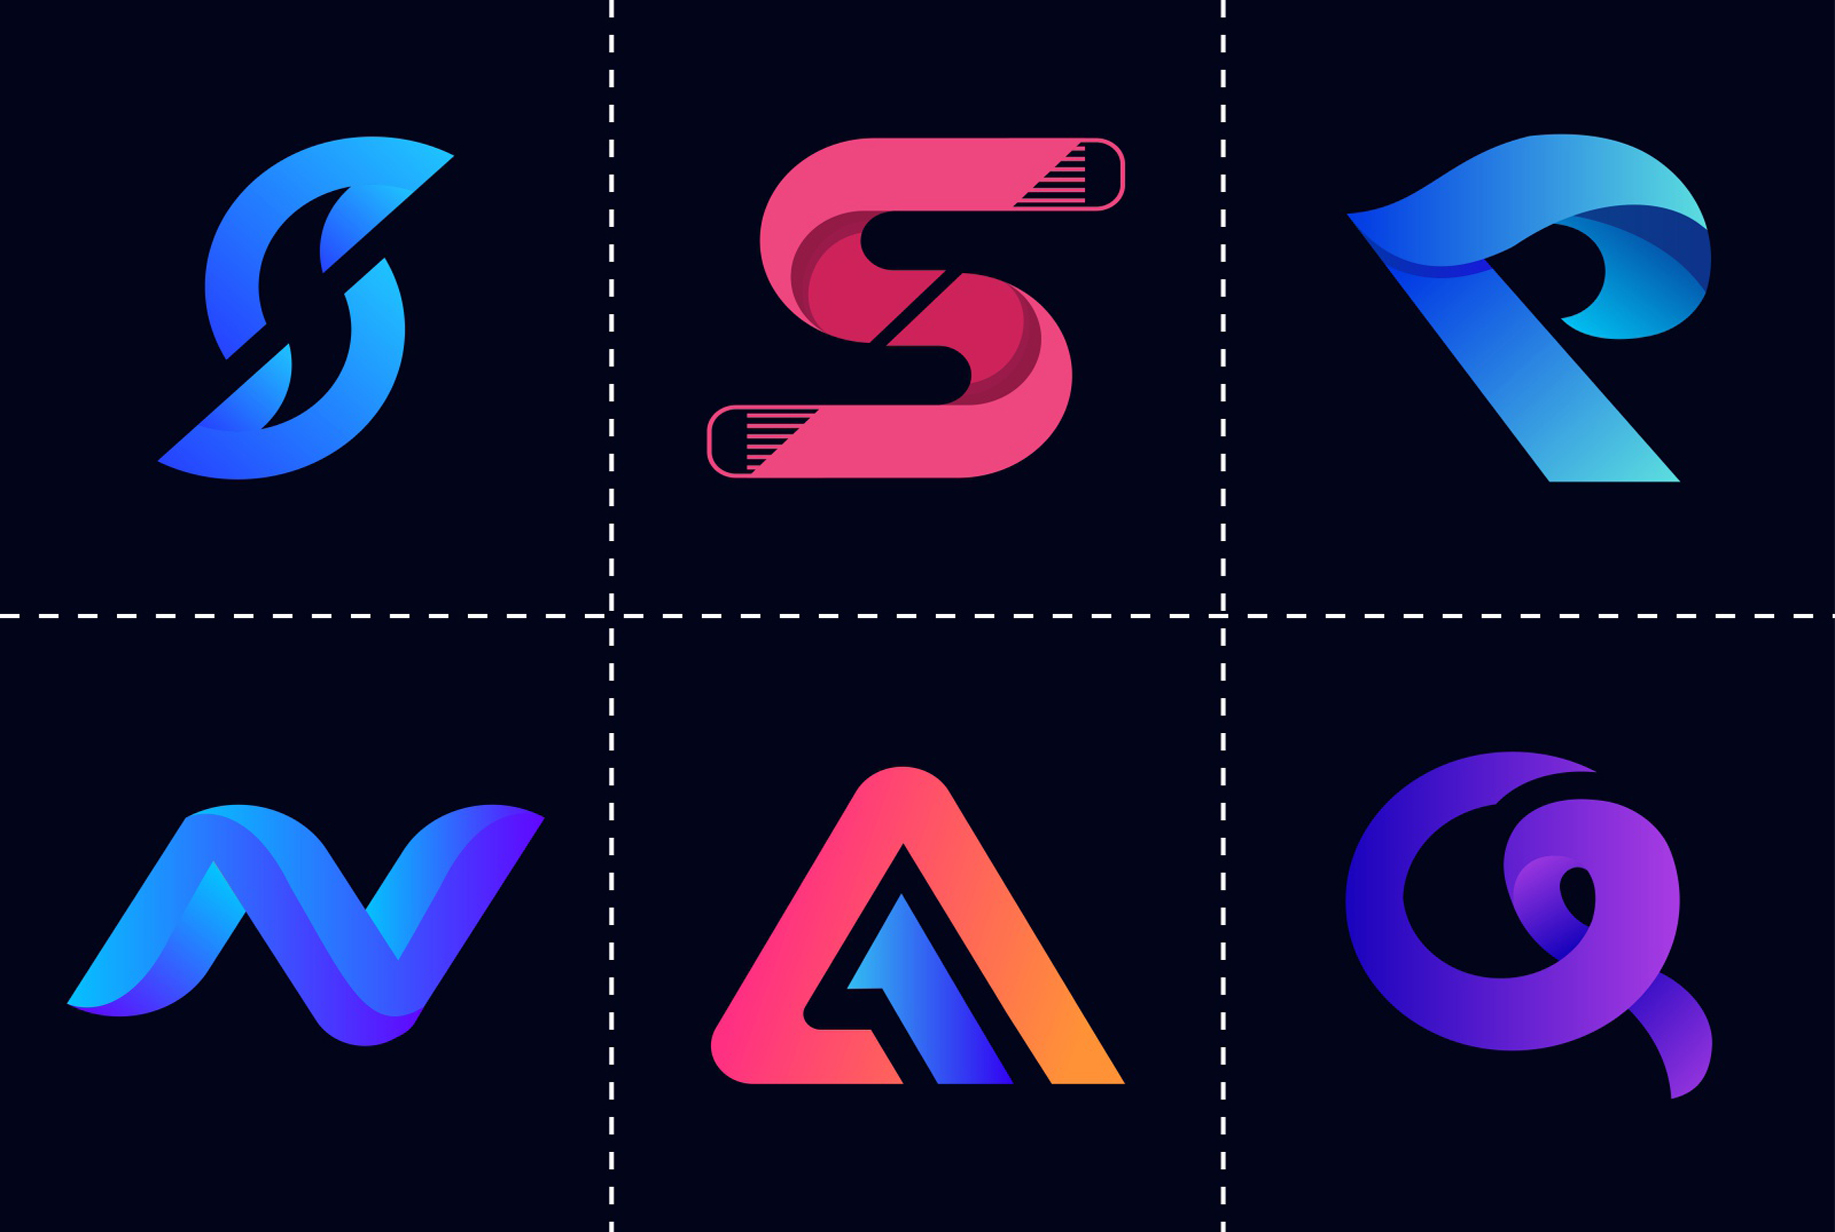 I will design professional modern minimalist business logo